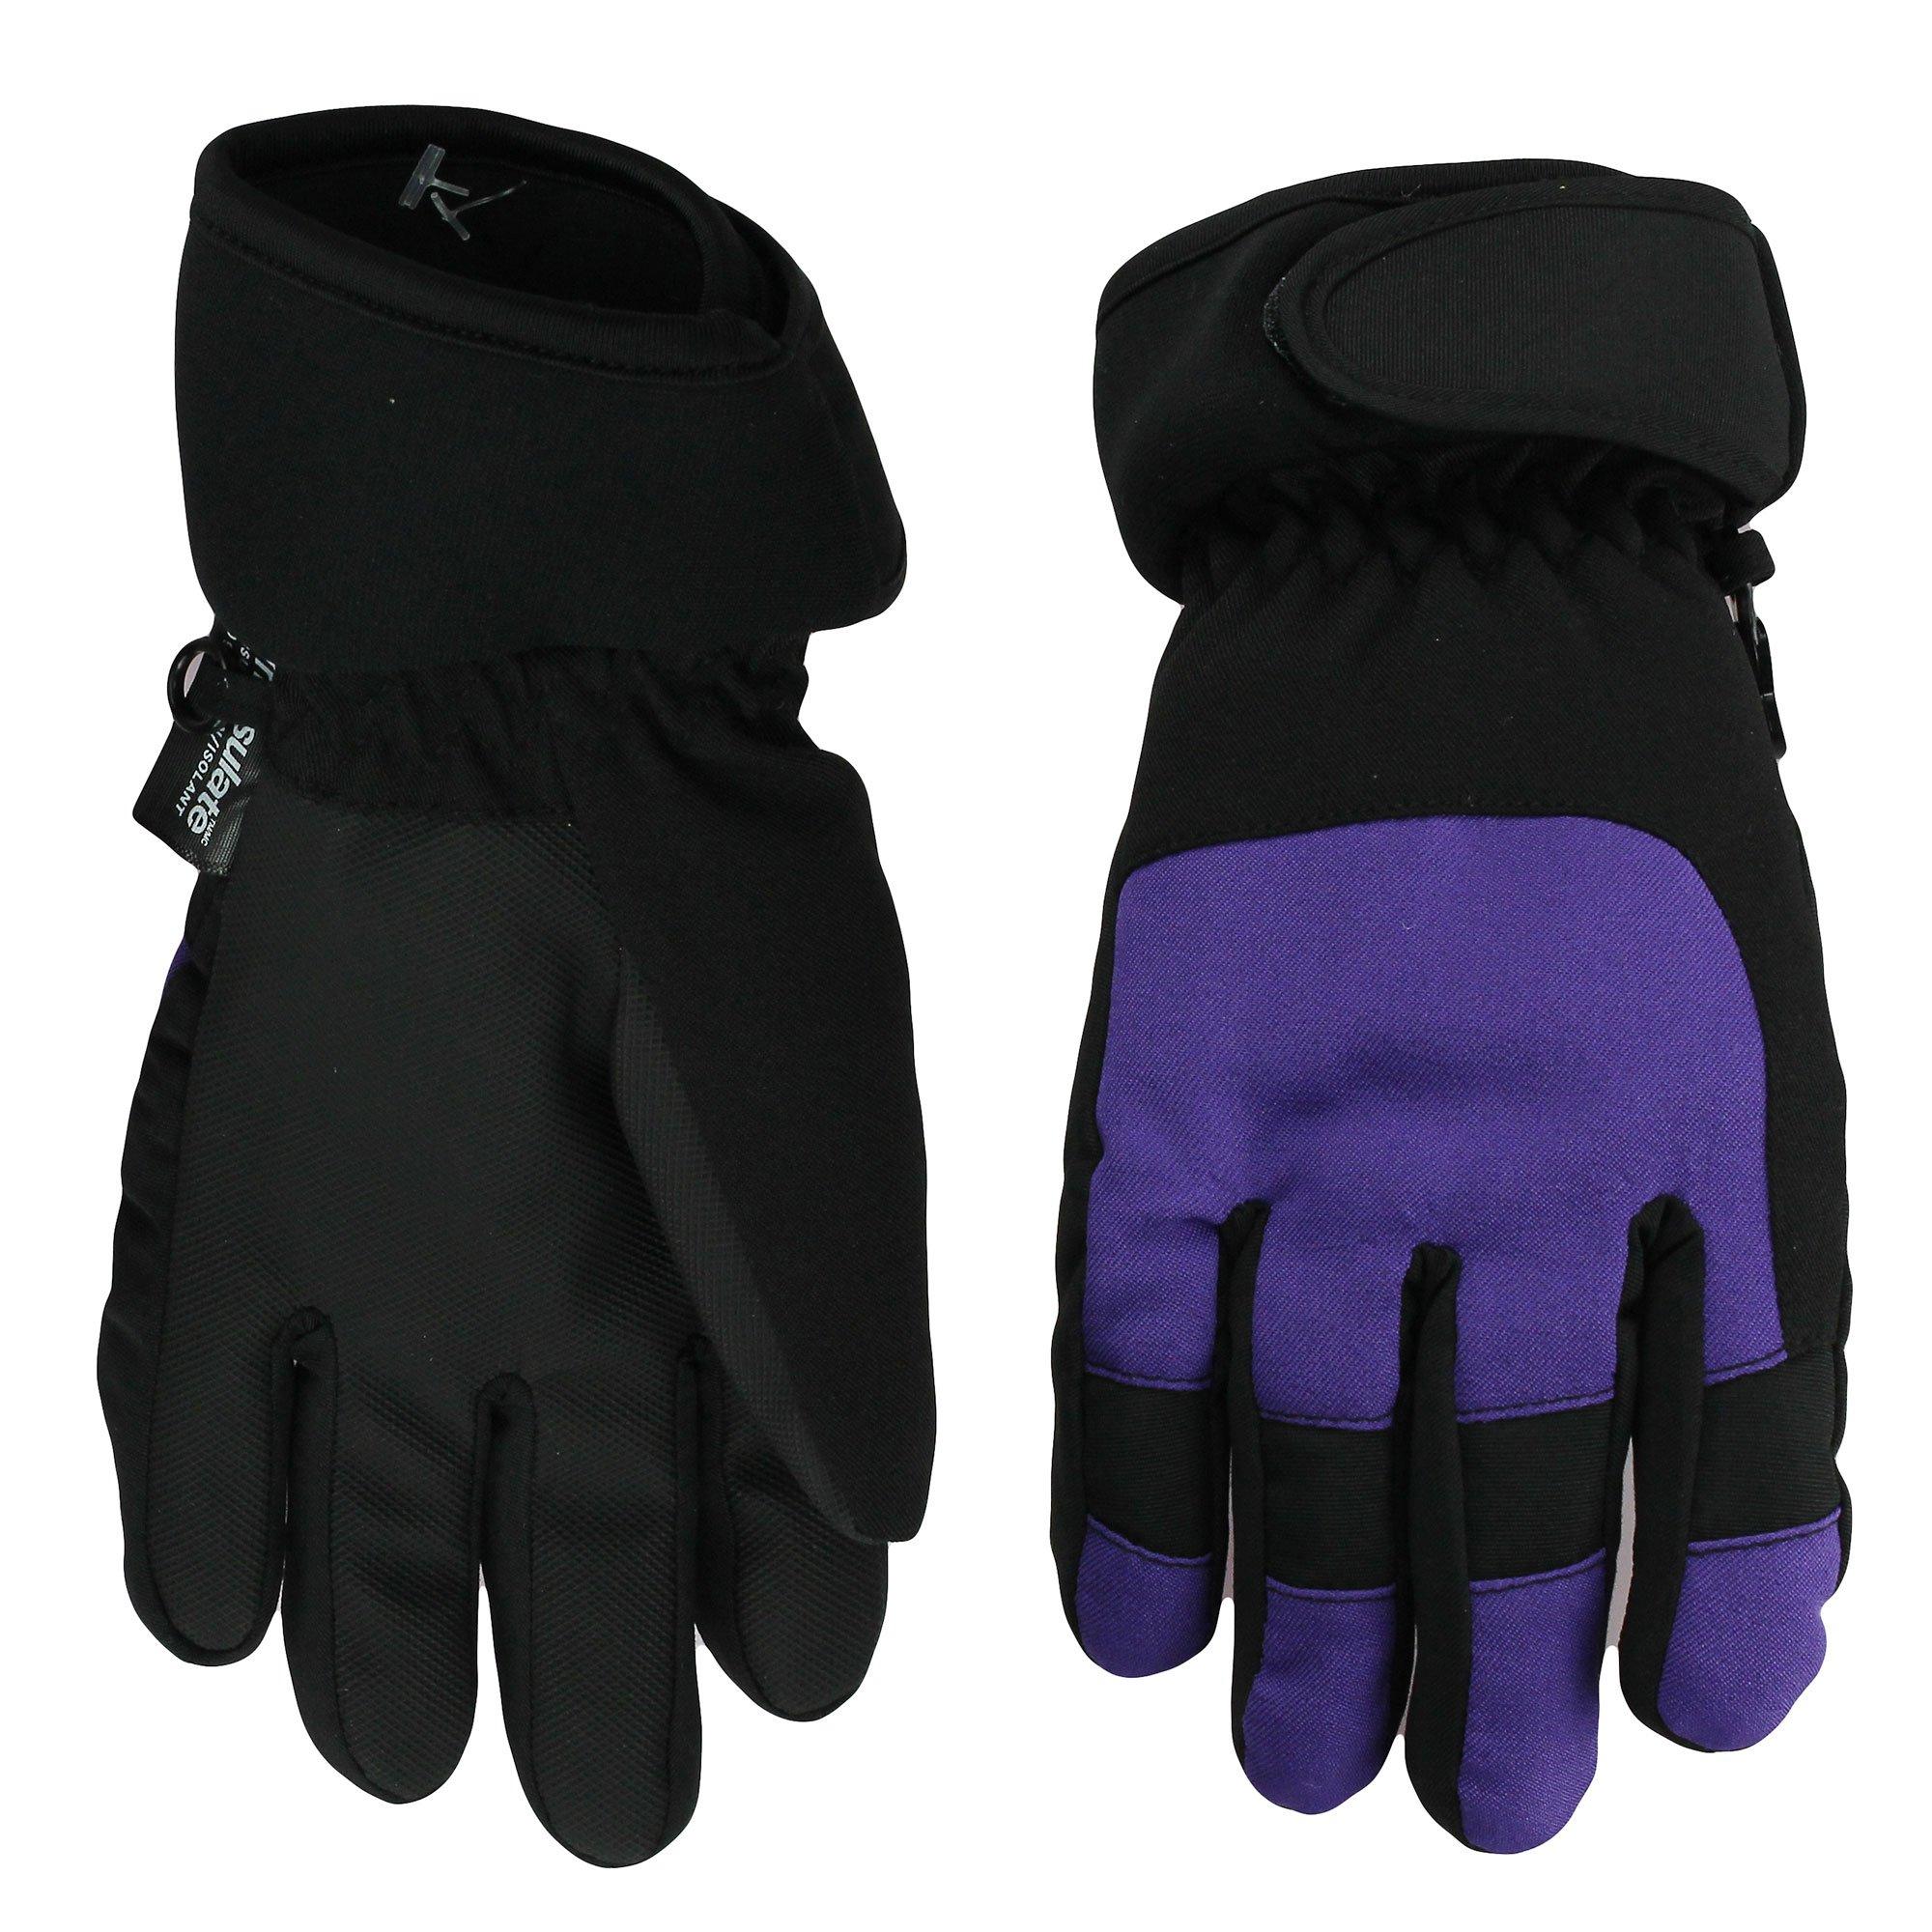 Nolan Girls Thinsulate Waterproof Colorblock Ski Gloves Purple Small-Med